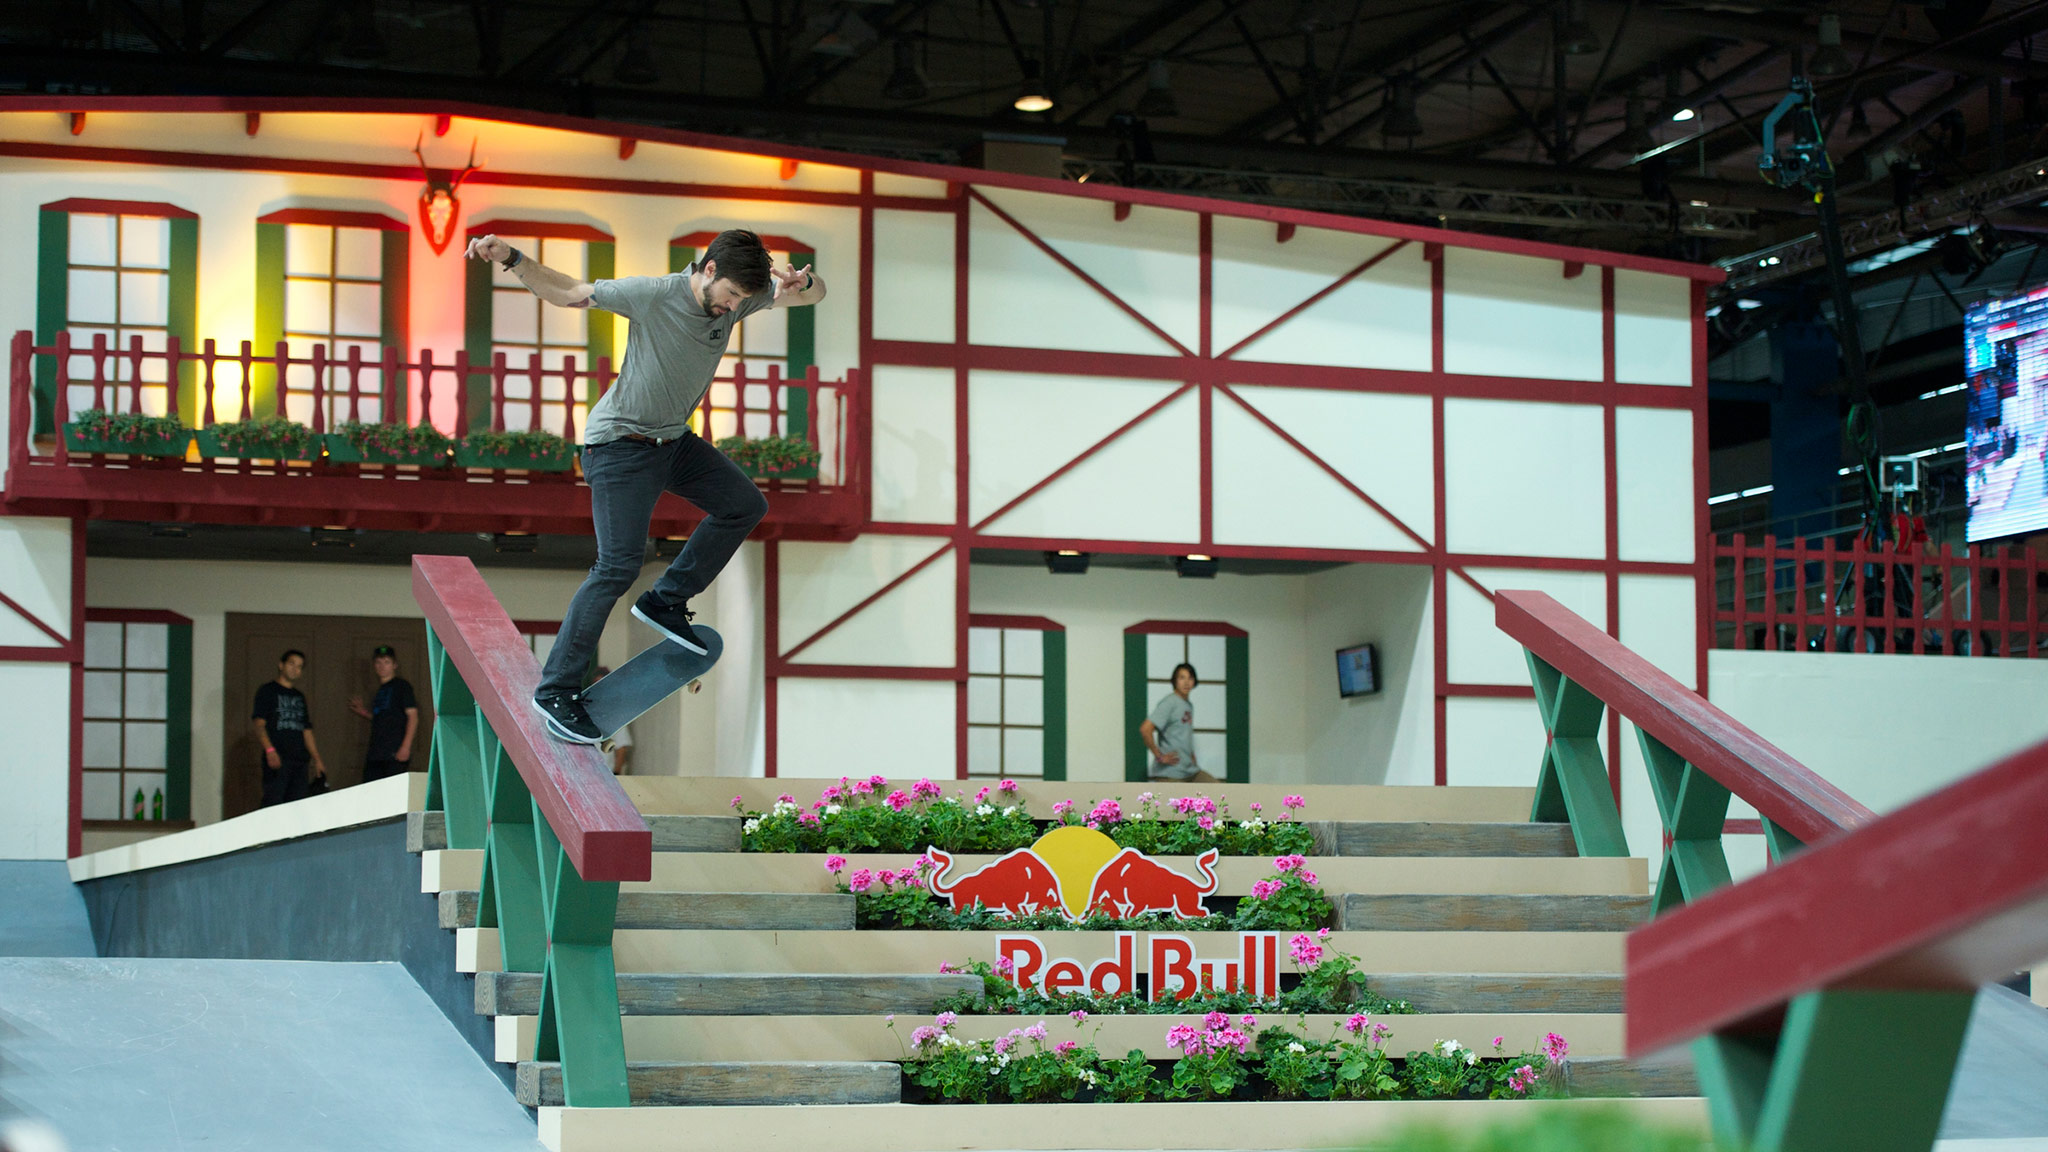 Chris Cole -- Street League Skateboarding